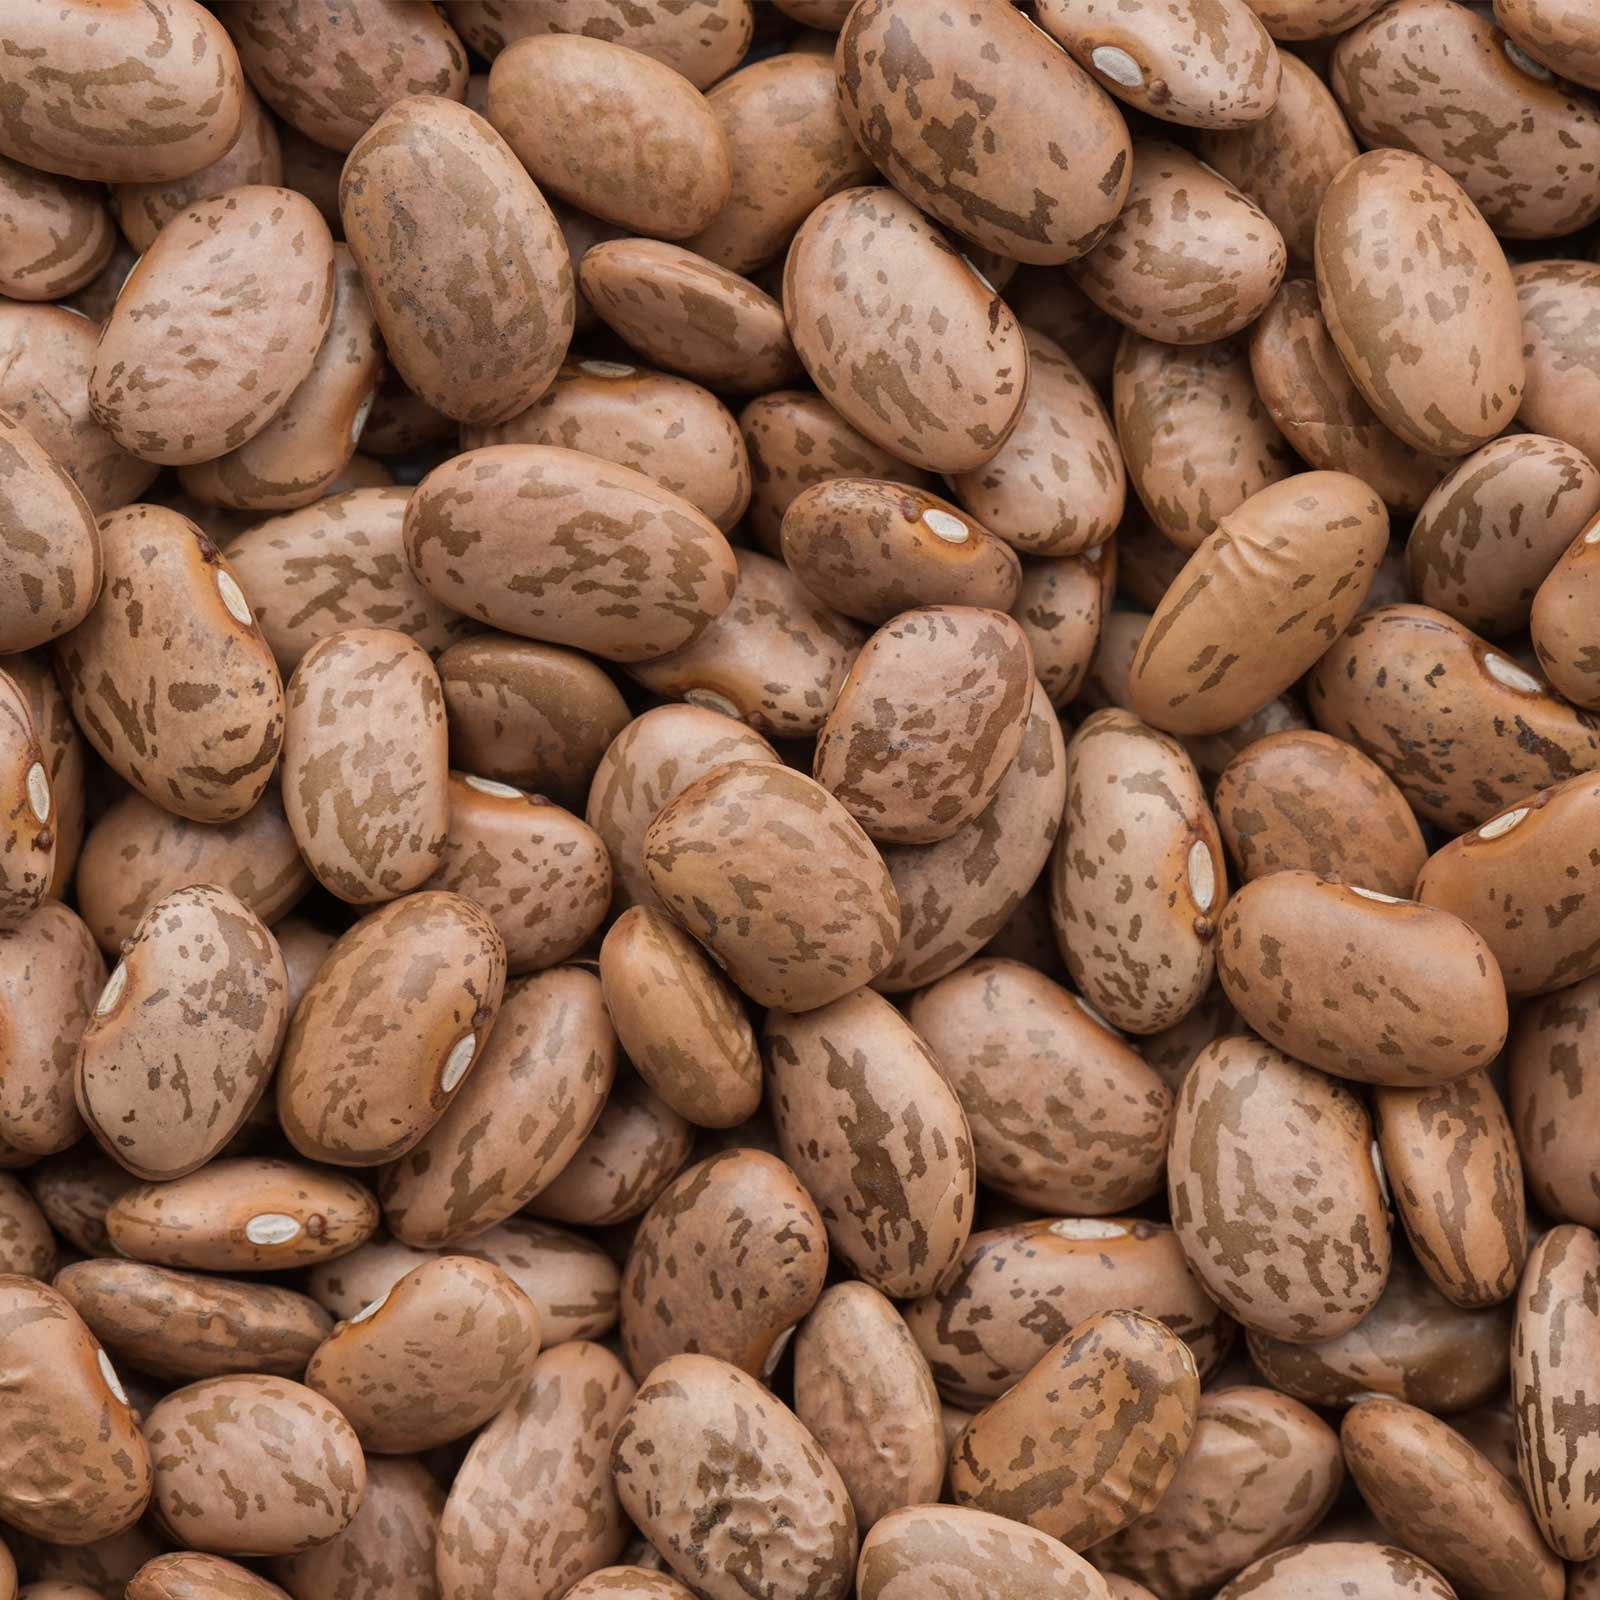 Pinto Bean Seeds - 50 Lb Bulk - Also Called Shell Pinto or Shelling Pinto - Non-GMO, Heirloom - Vegetable Garden Seeds by Mountain Valley Seed Company